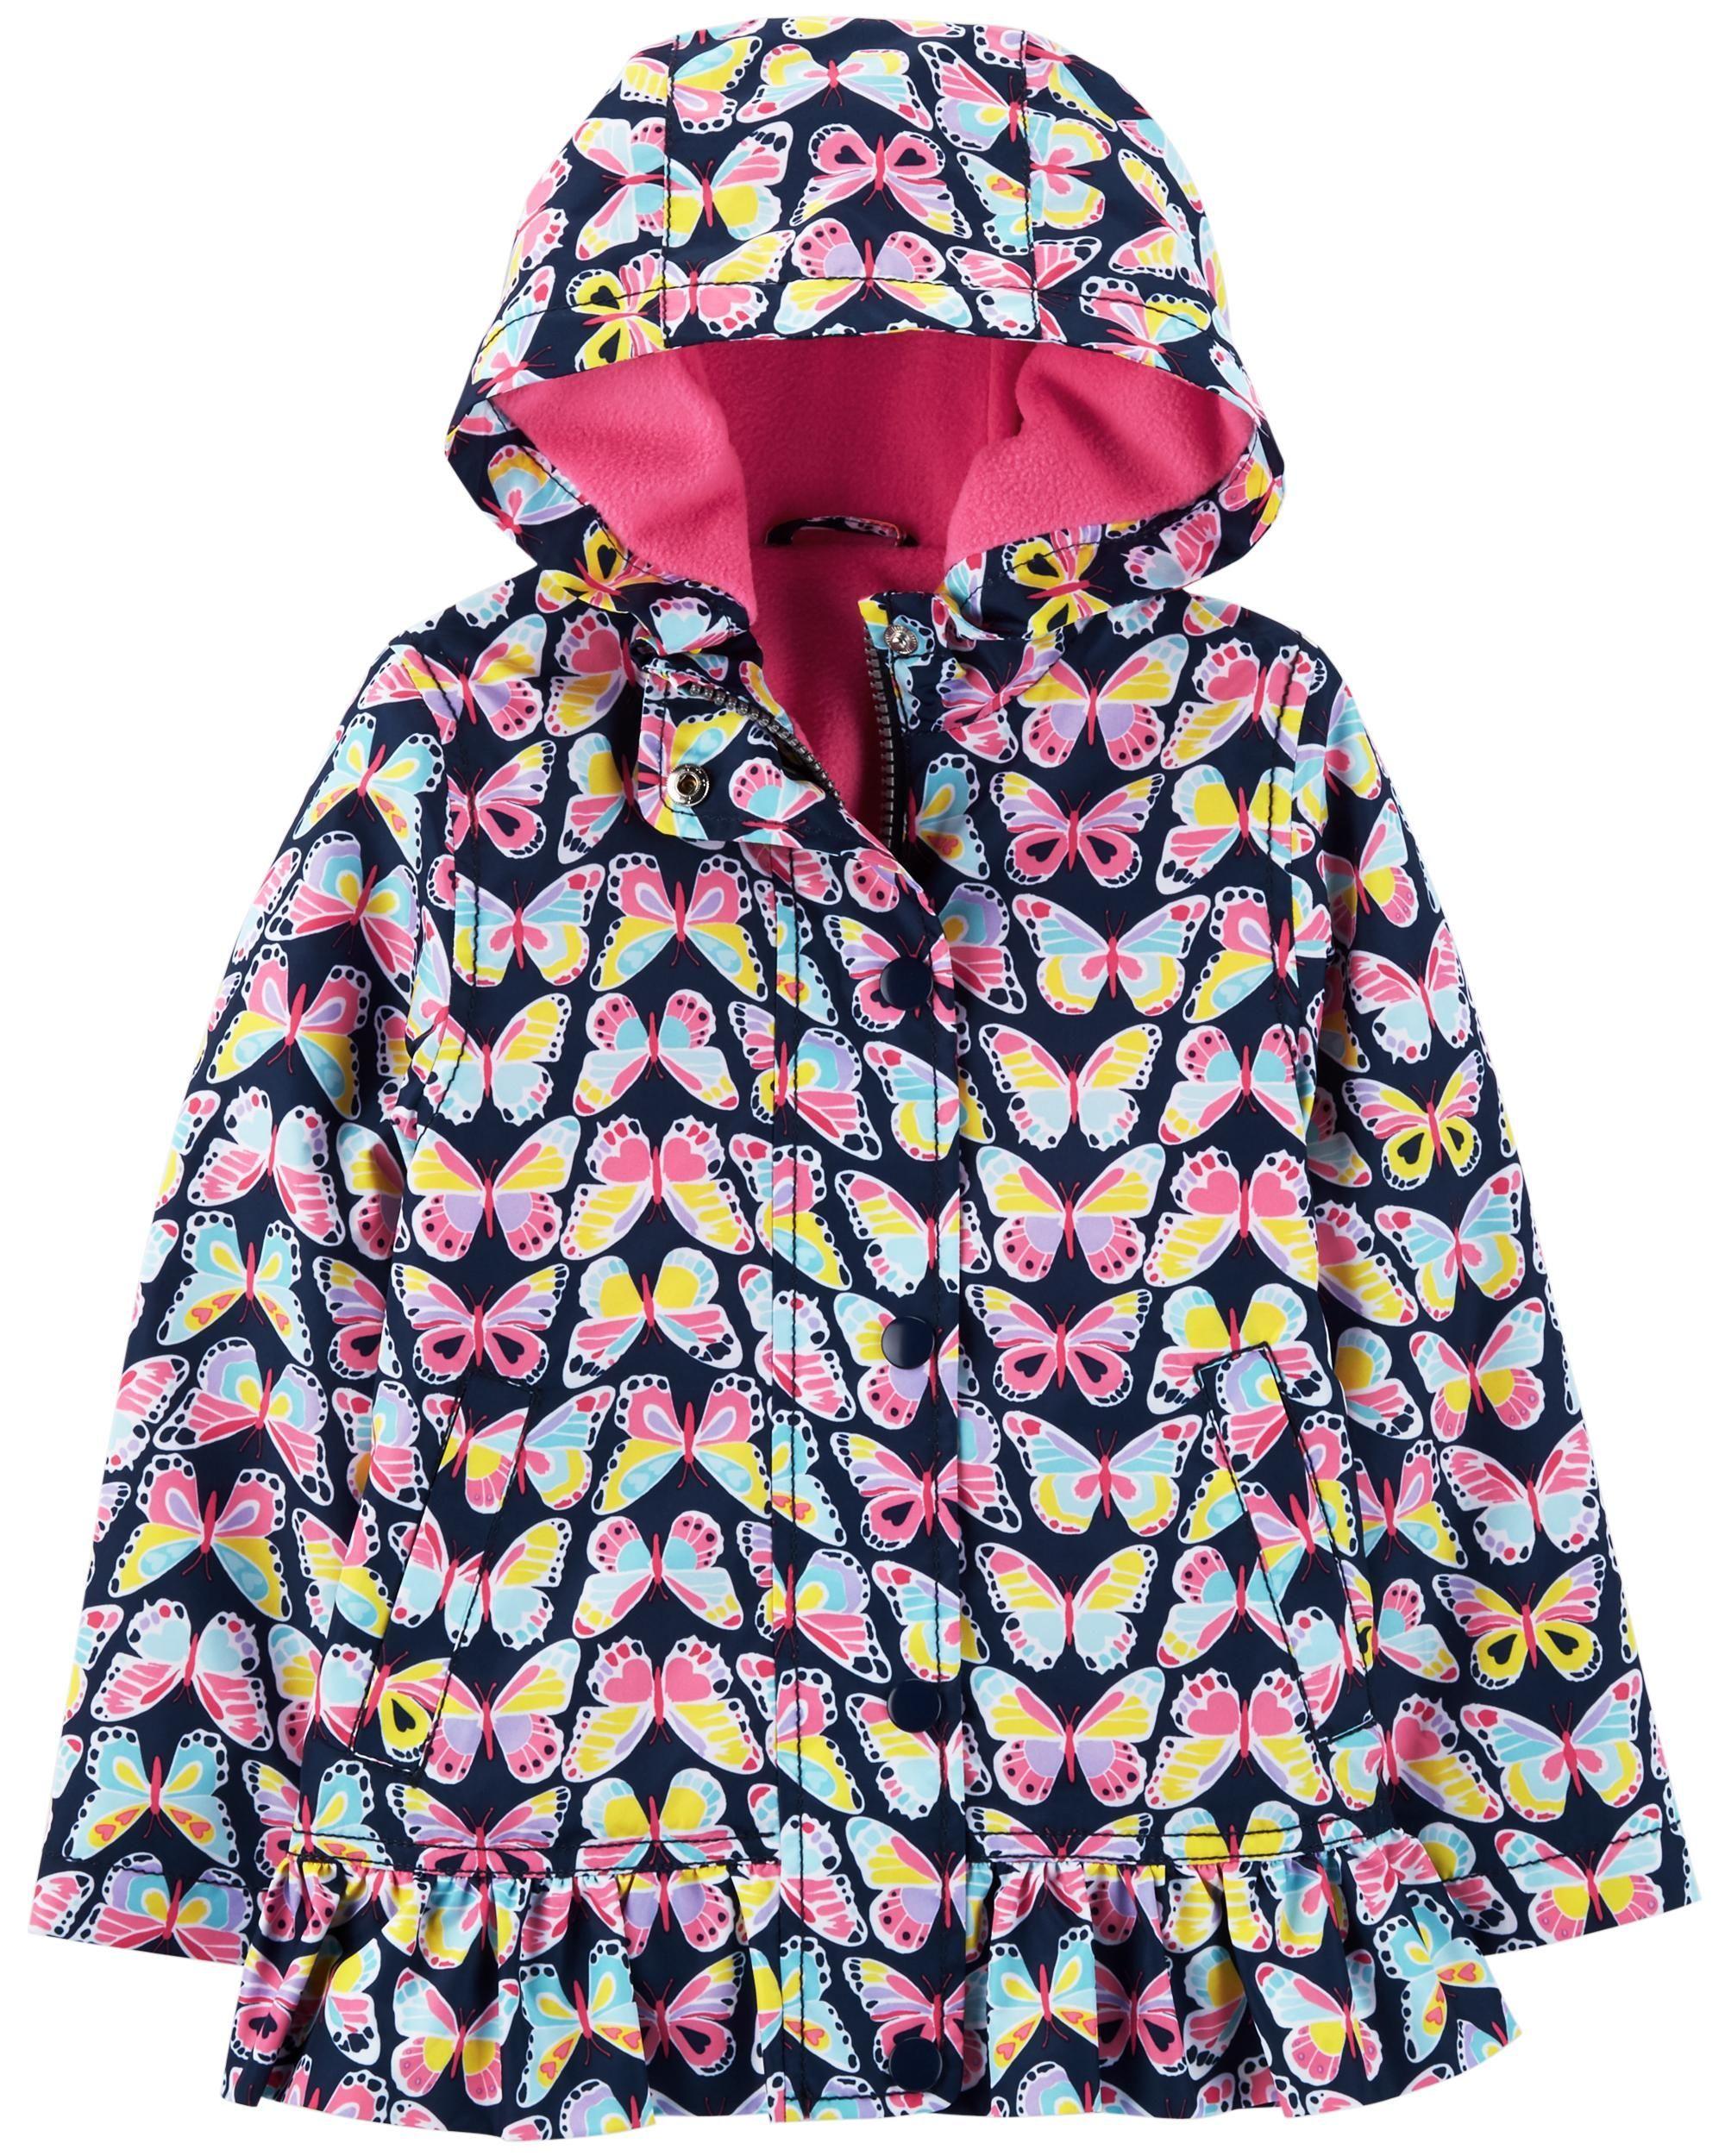 b43ef81b5 Butterfly Fleece-Lined Rain Jacket | Clothing Shopping | Jackets ...